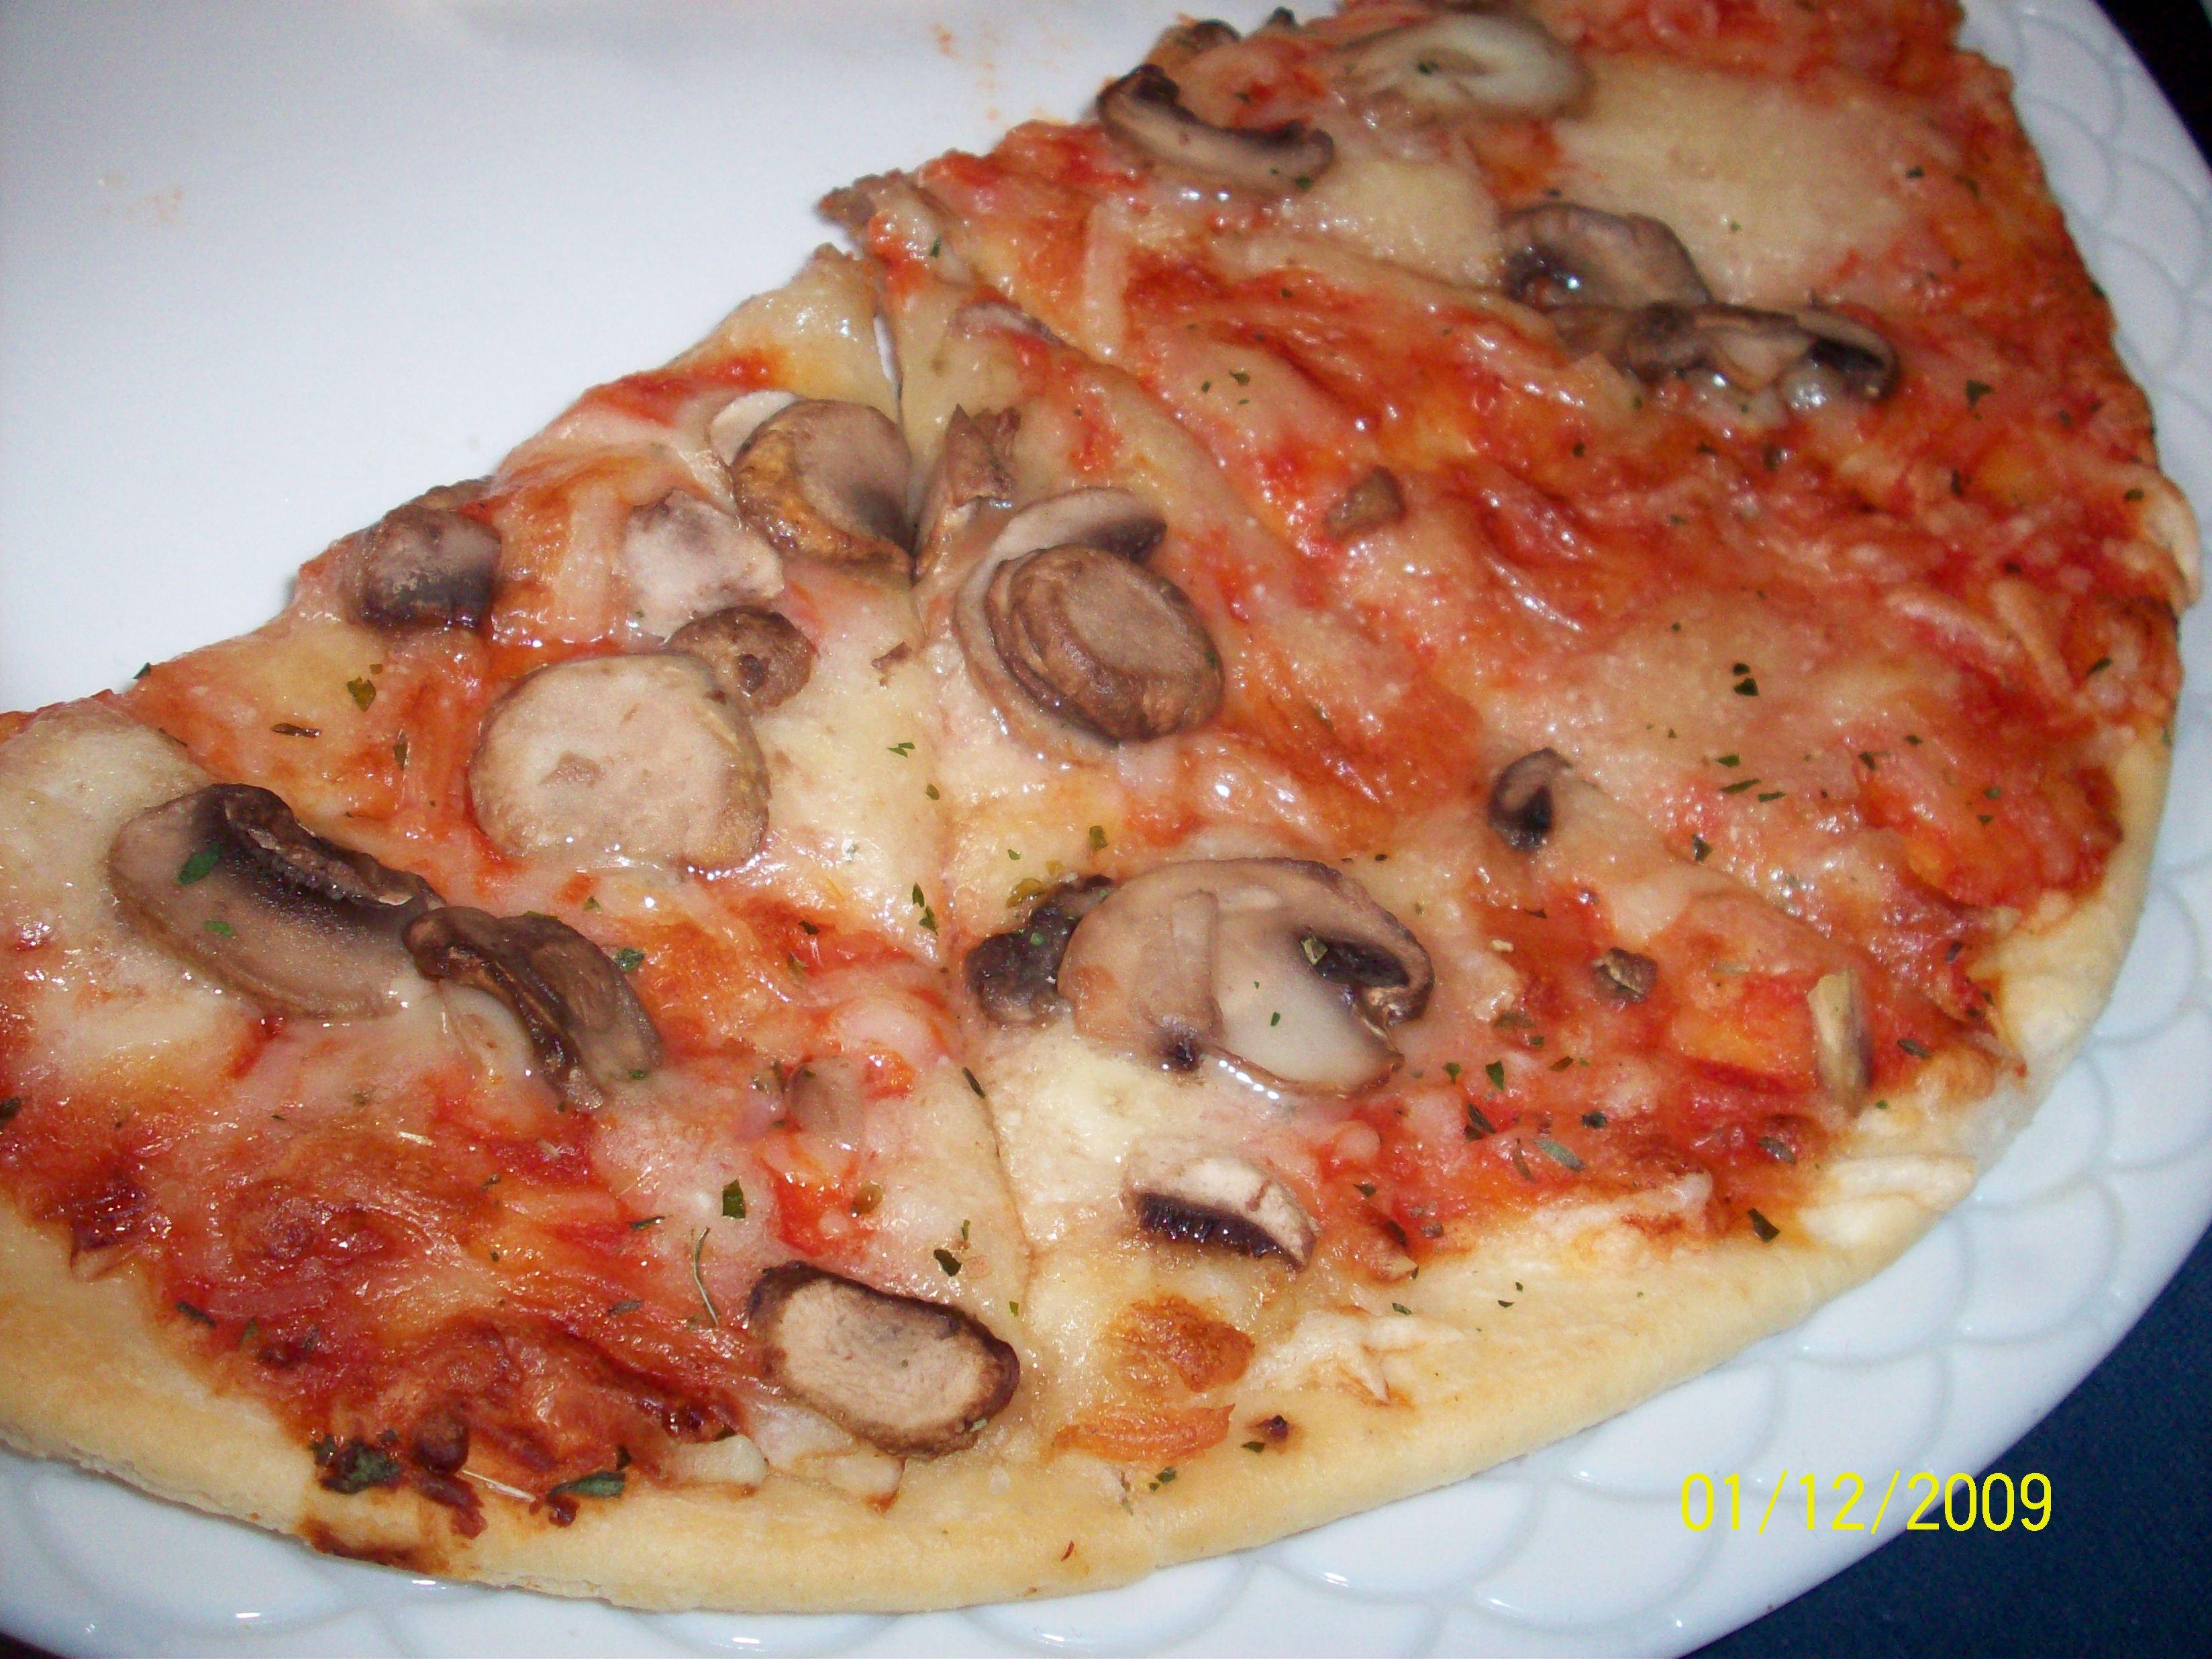 http://foodloader.net/cutie_2009-12-01_Pizza.jpg